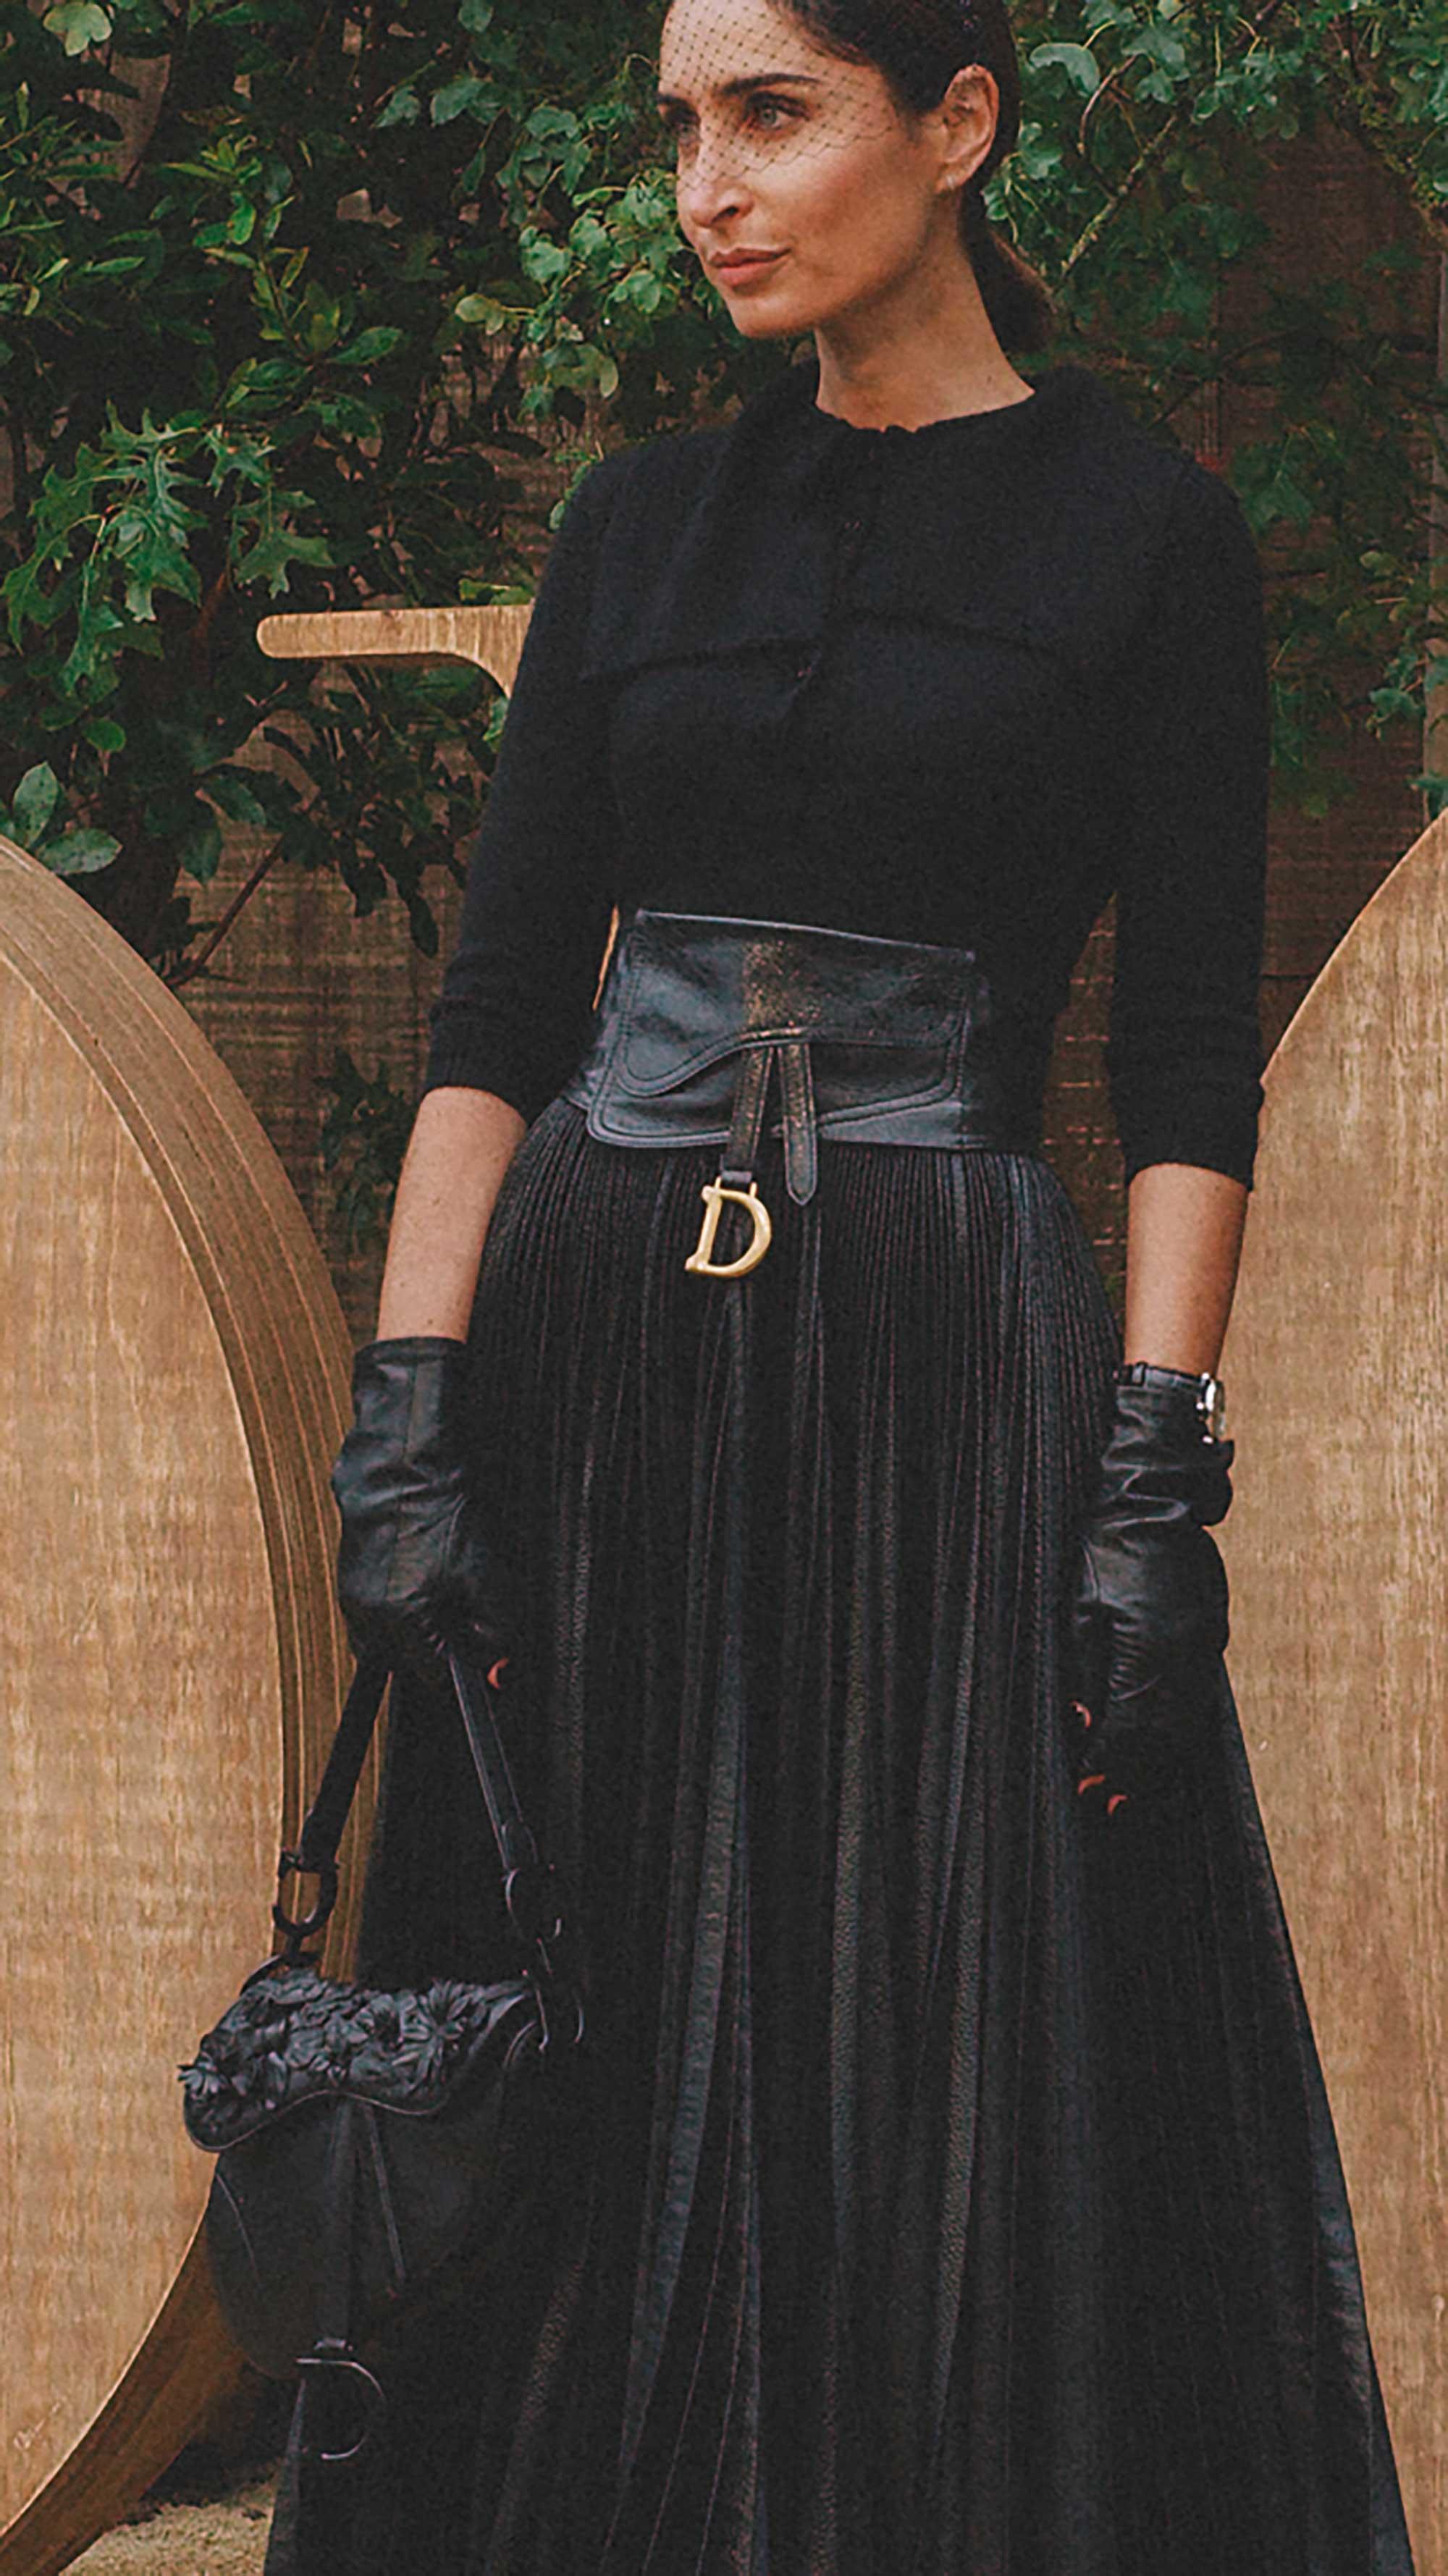 Best outfits of Paris Fashion Week street style 2019 day one PFW SS20 Photo by @J2martinez Jose J. Martinez -39.jpg